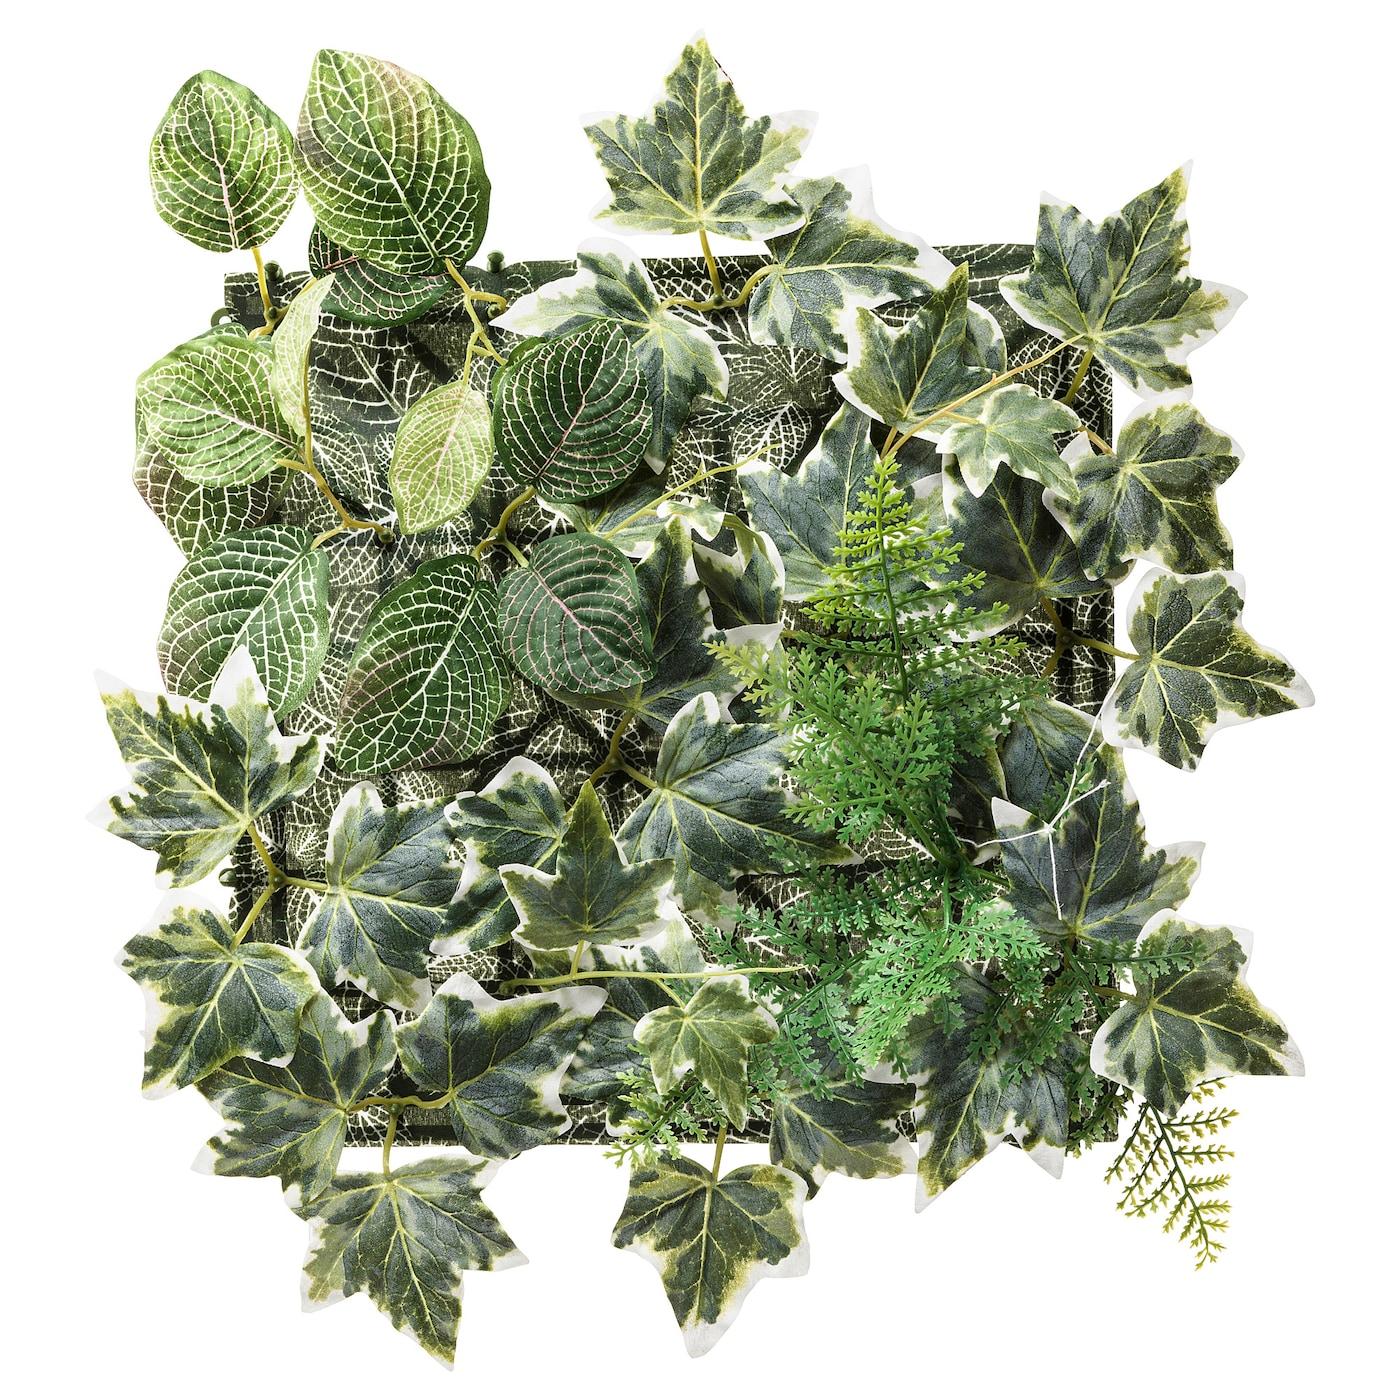 Artificial Plants Fake 56 leaves Foliage Bush Home Garden Office Wedding K5H2